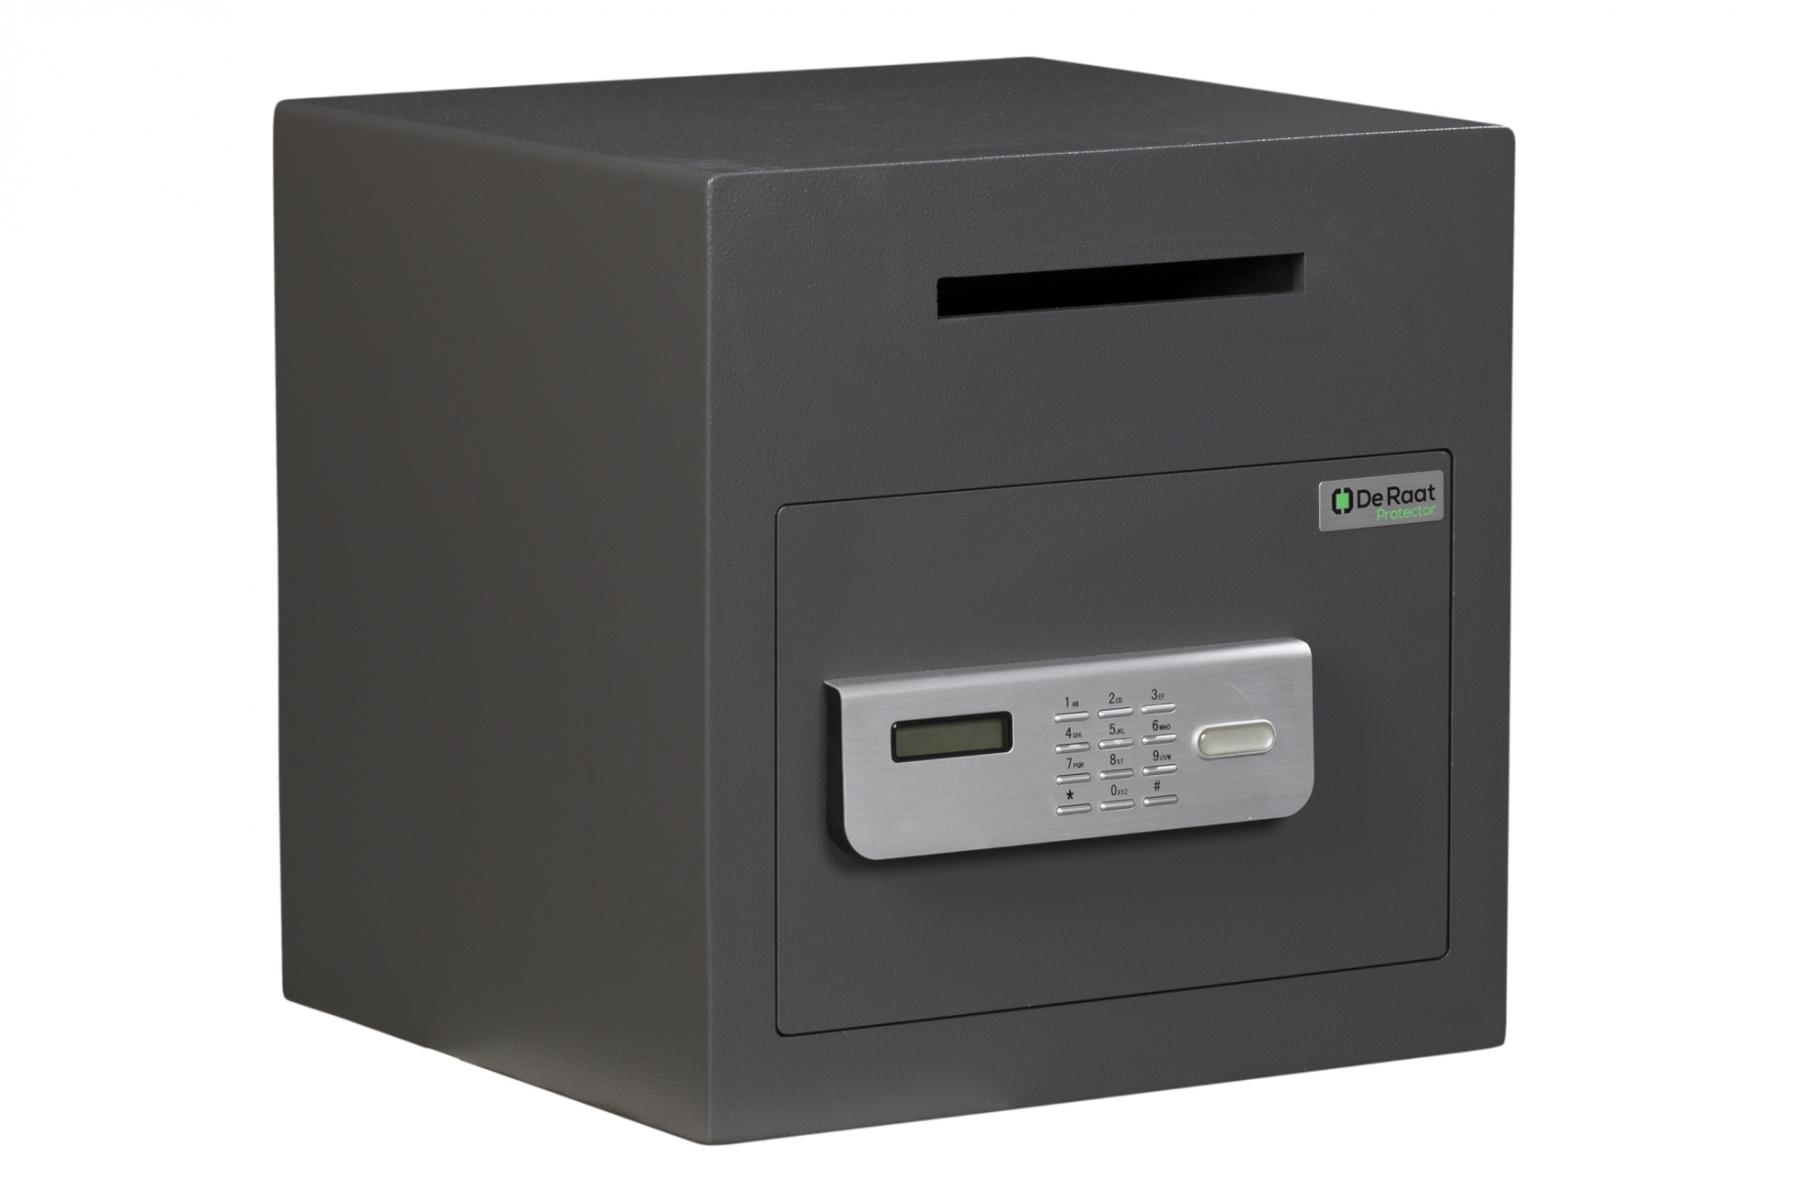 De Raat Protector Deposit Cash 1E